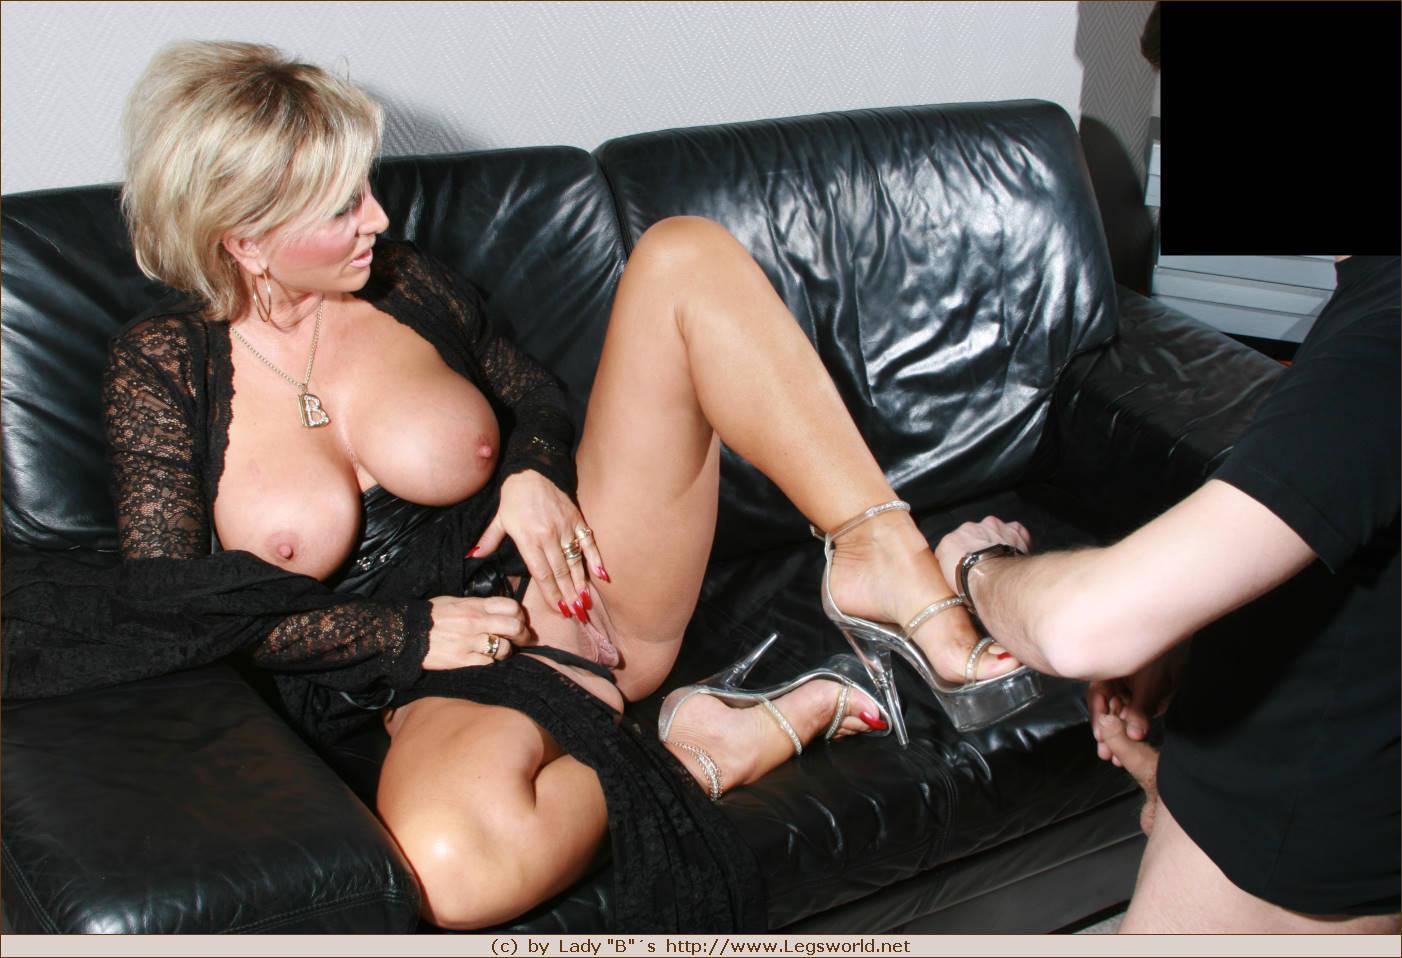 Секси леди порно фото, Секси Леди Частные порно фото девушек 6 фотография